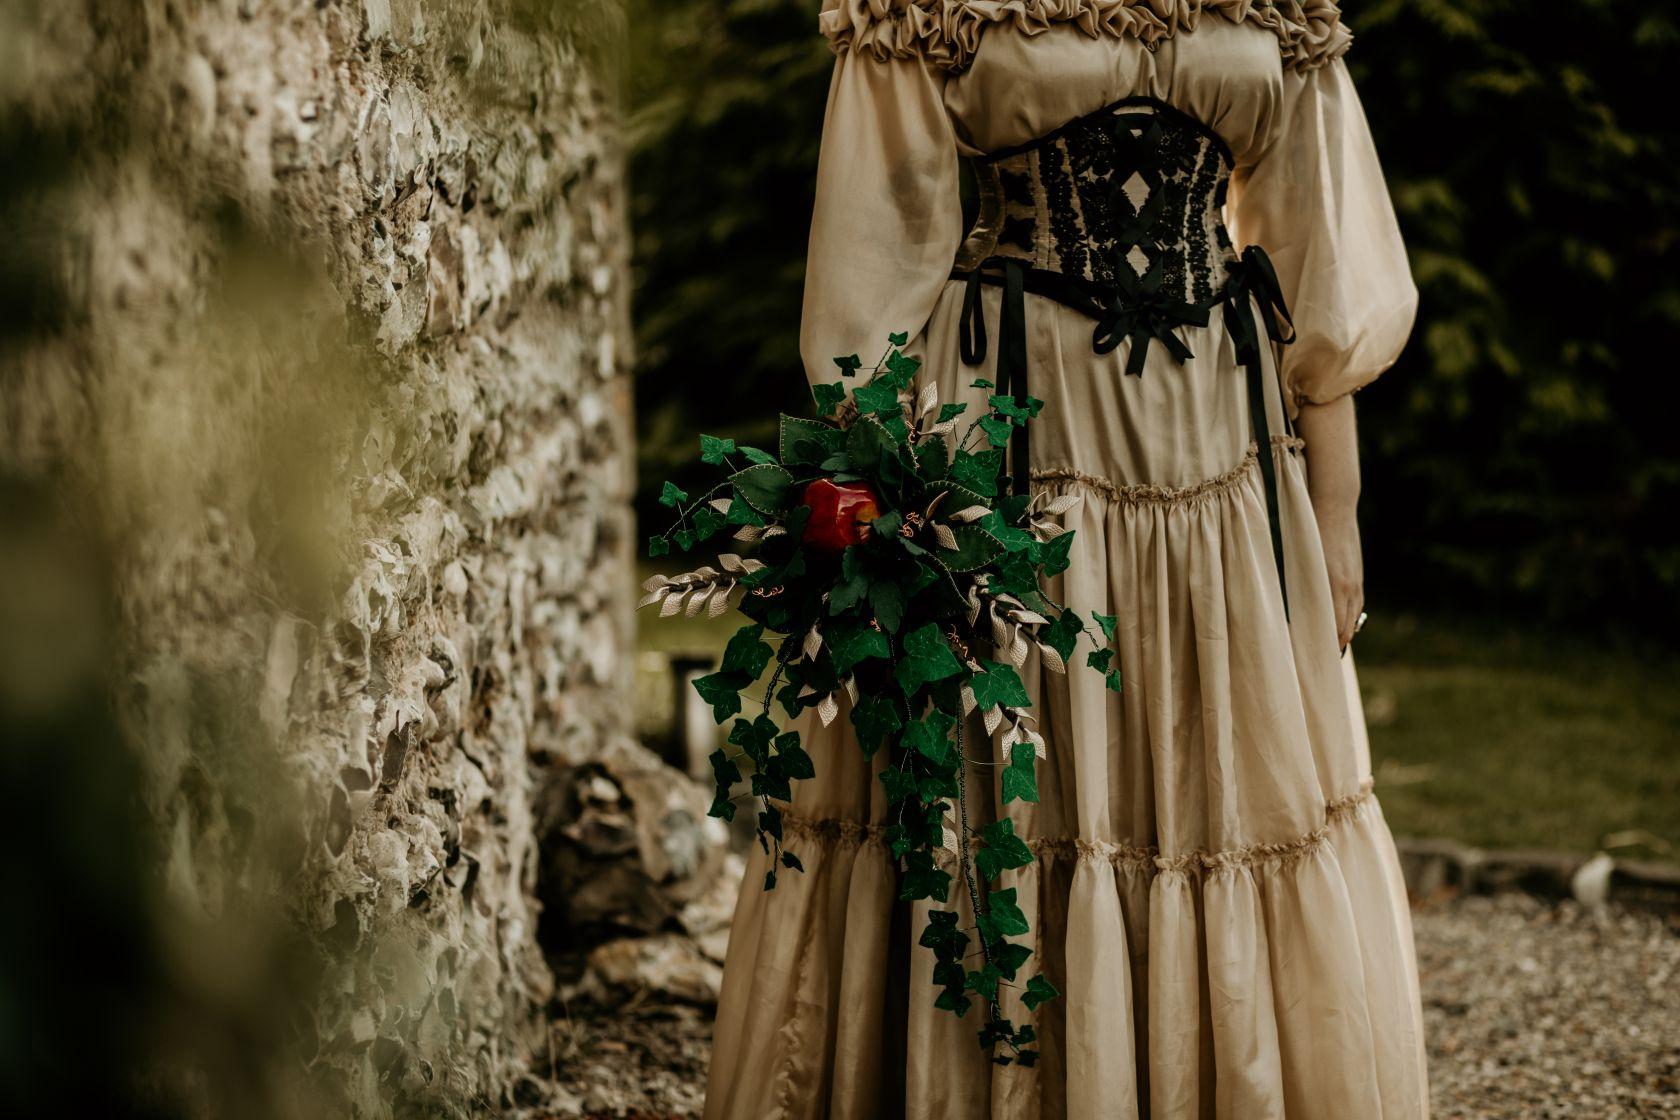 alternative fairytale wedding- snow white wedding- charlotte laurie designs-chloe mary photo- unconventional wedding- alternative wedding inspiration- corset wedding dress- coloured wedding dress